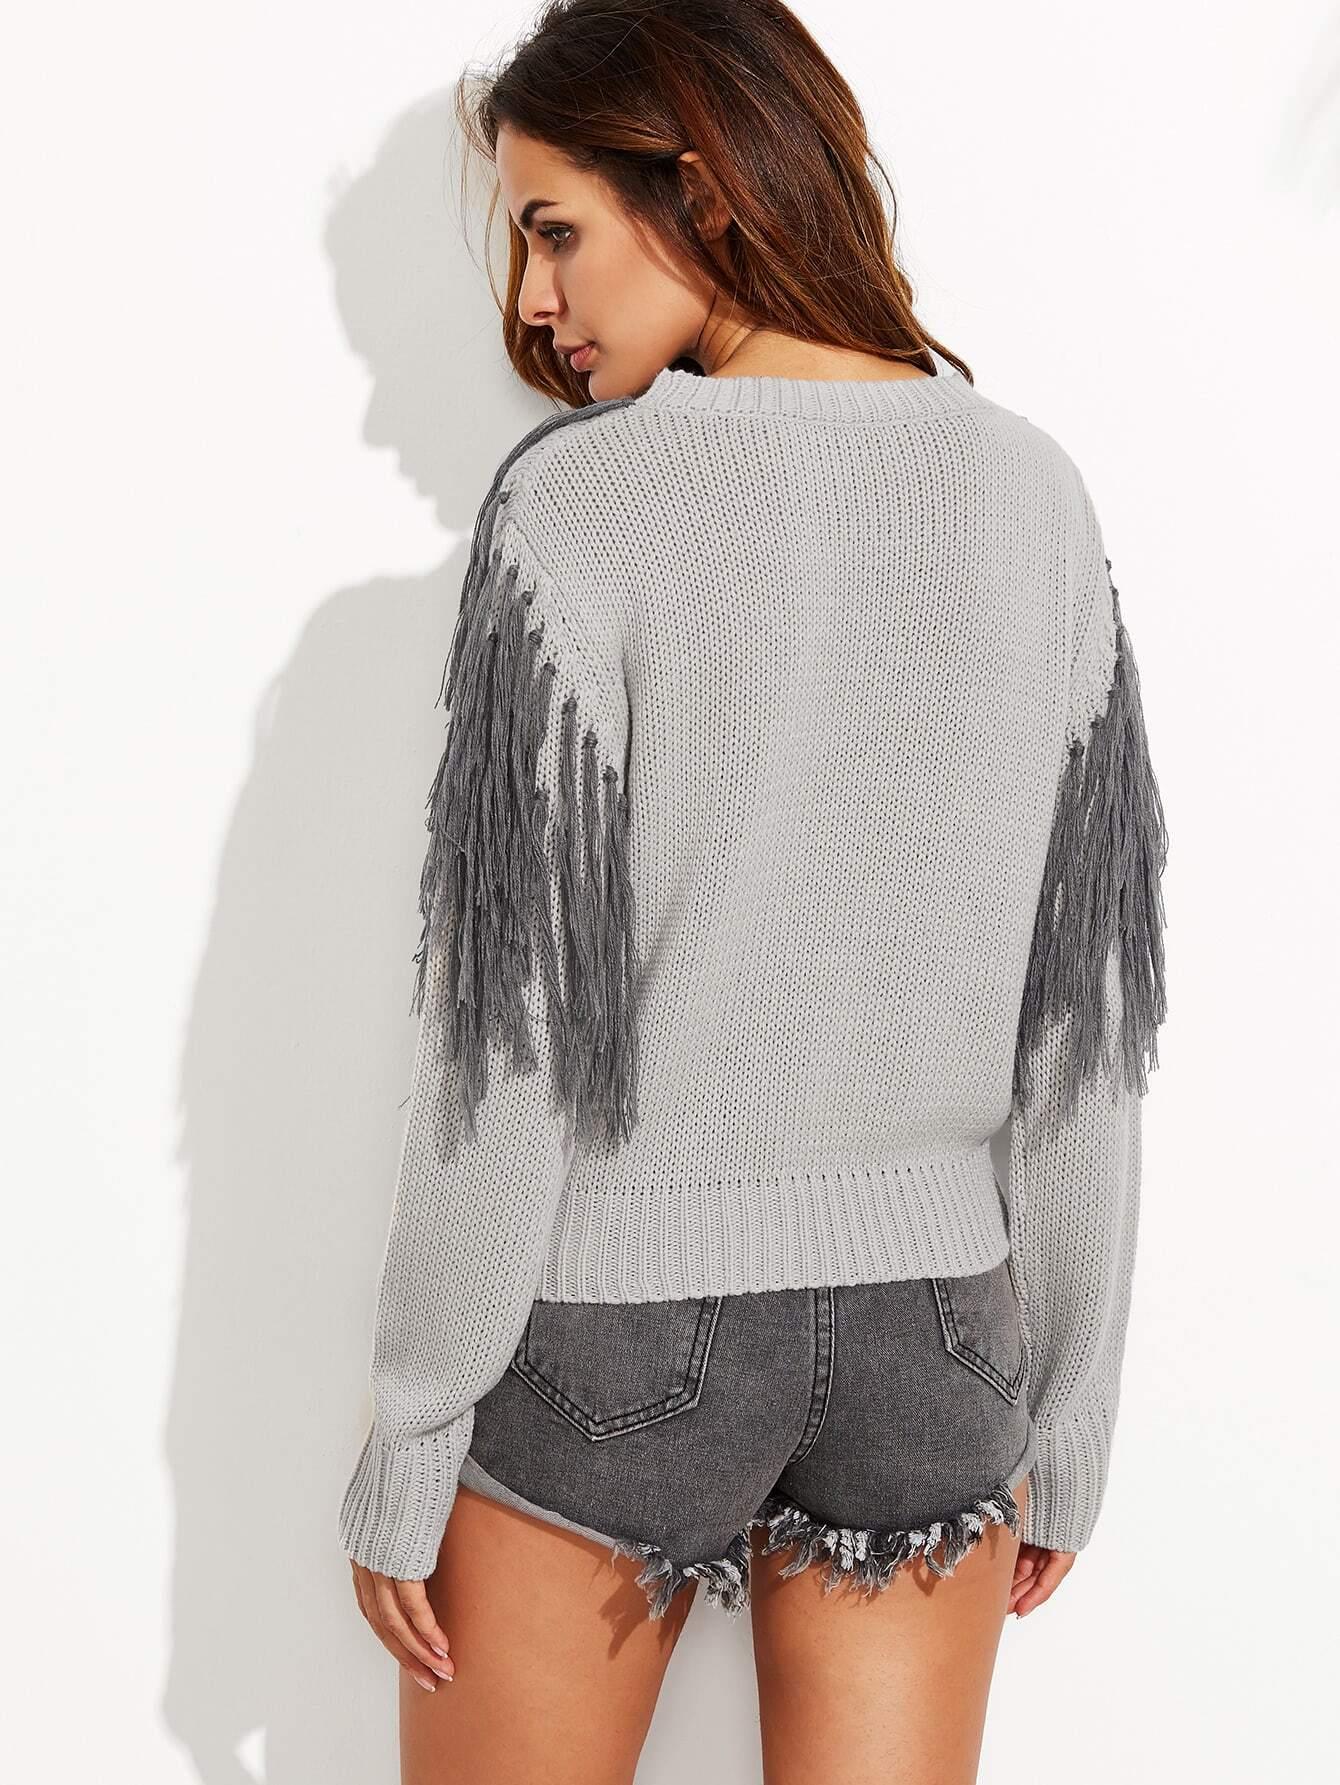 sweater160816702_2